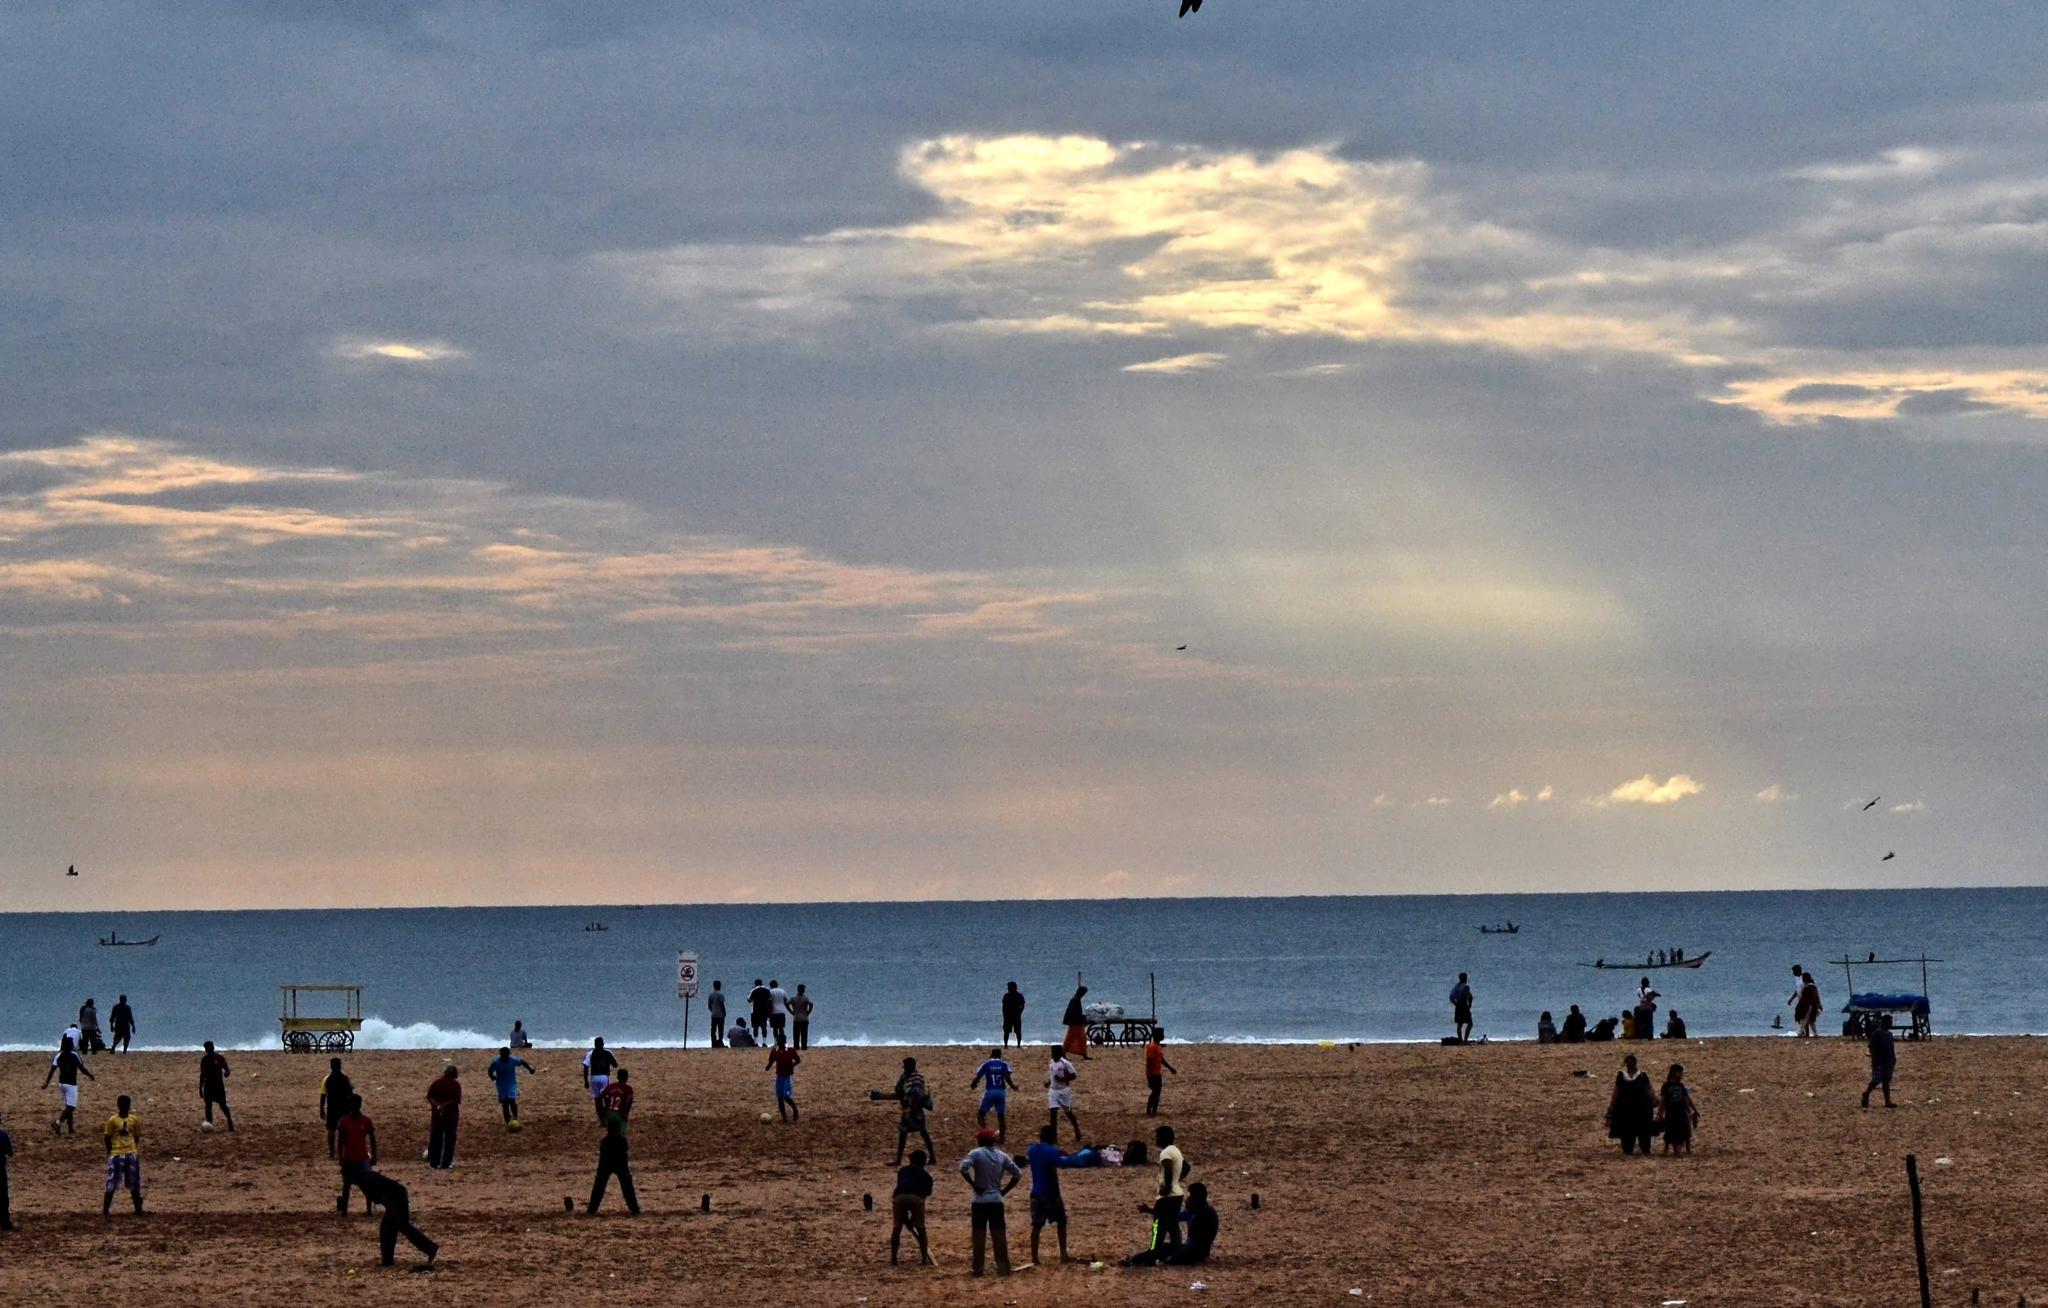 Marina Beach, Chennai by Radhamadhavan K S